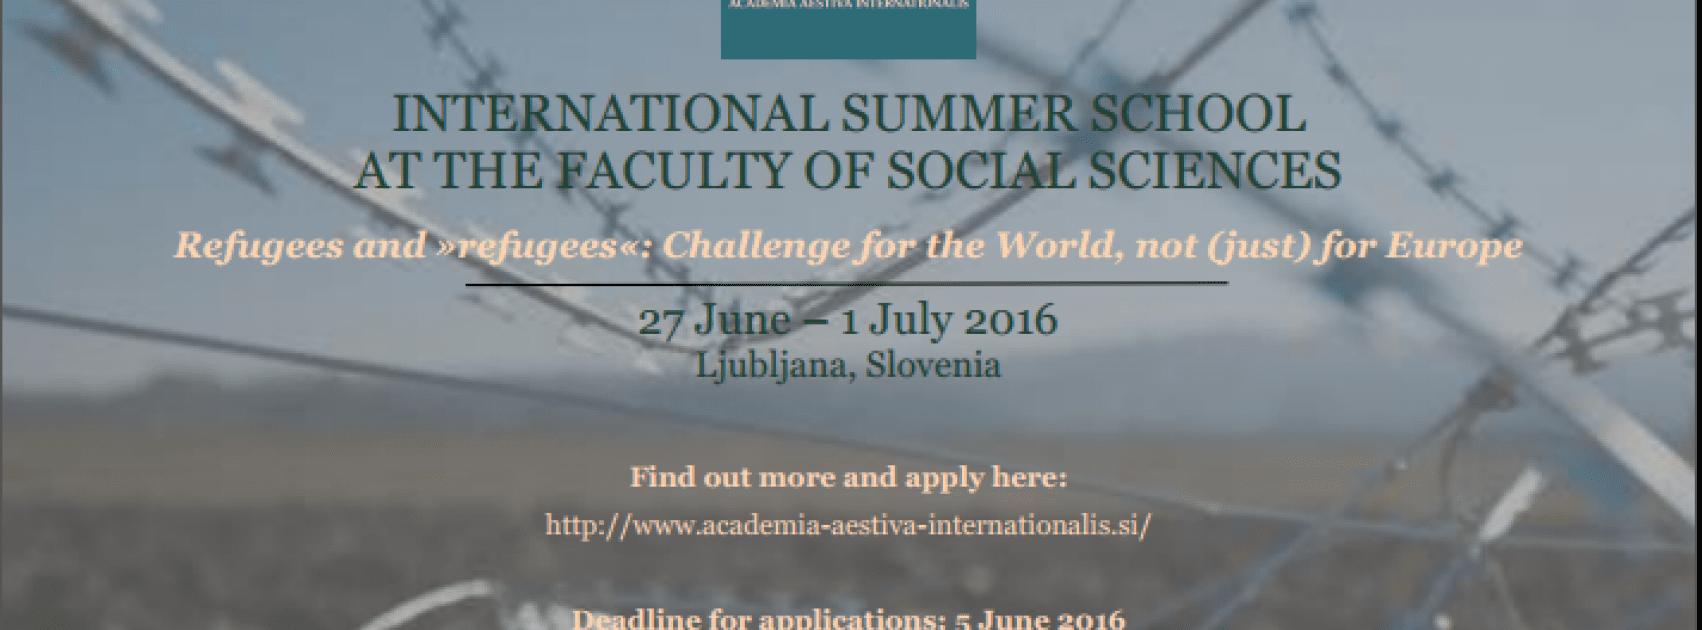 Poletna šola Academia Aestiva Internationalis